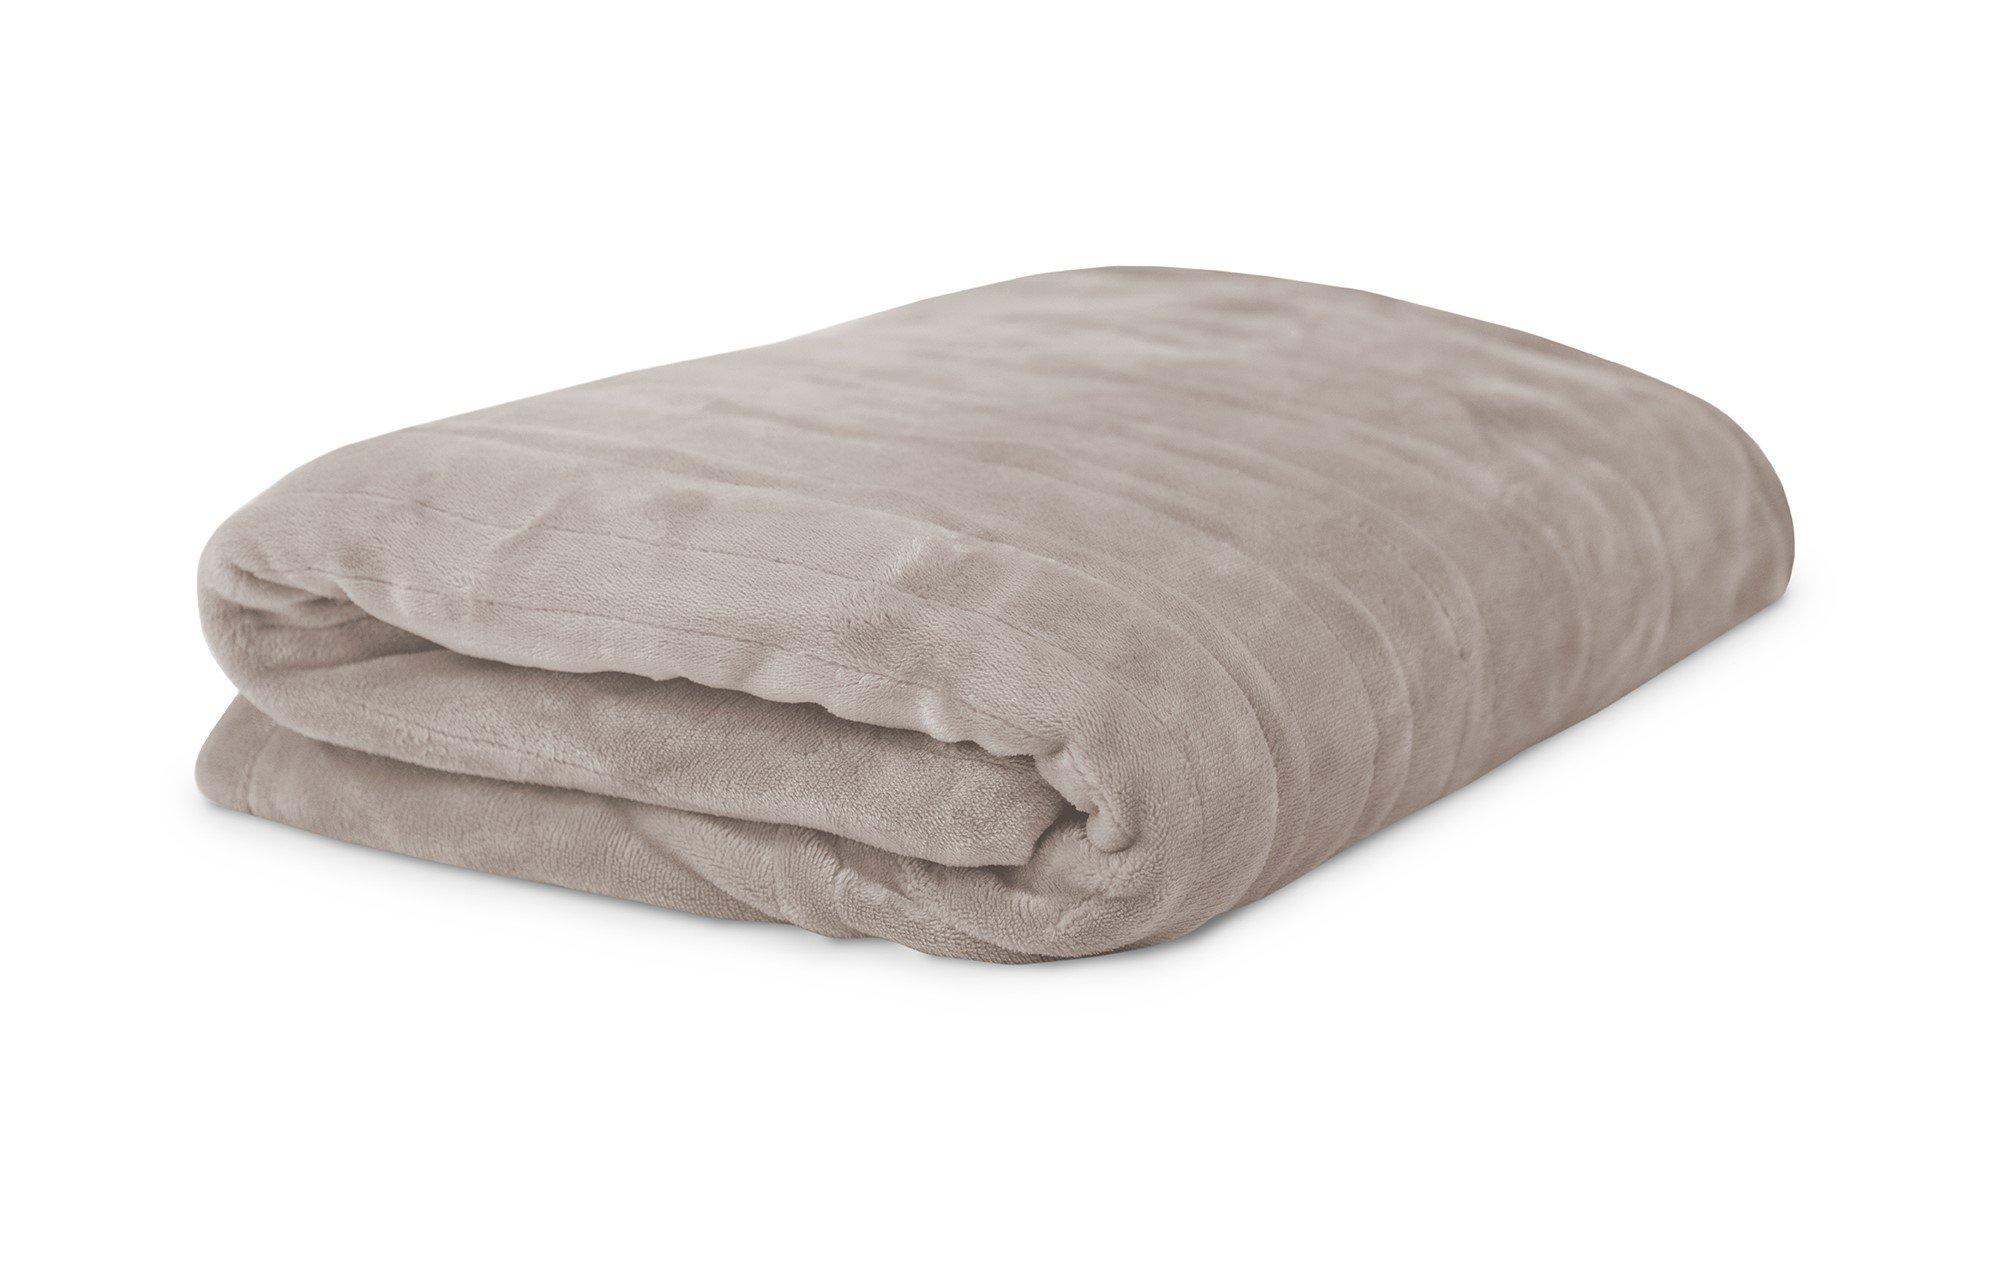 BlanQuil Toasty Electric Blanket Heated blanket, Blanket